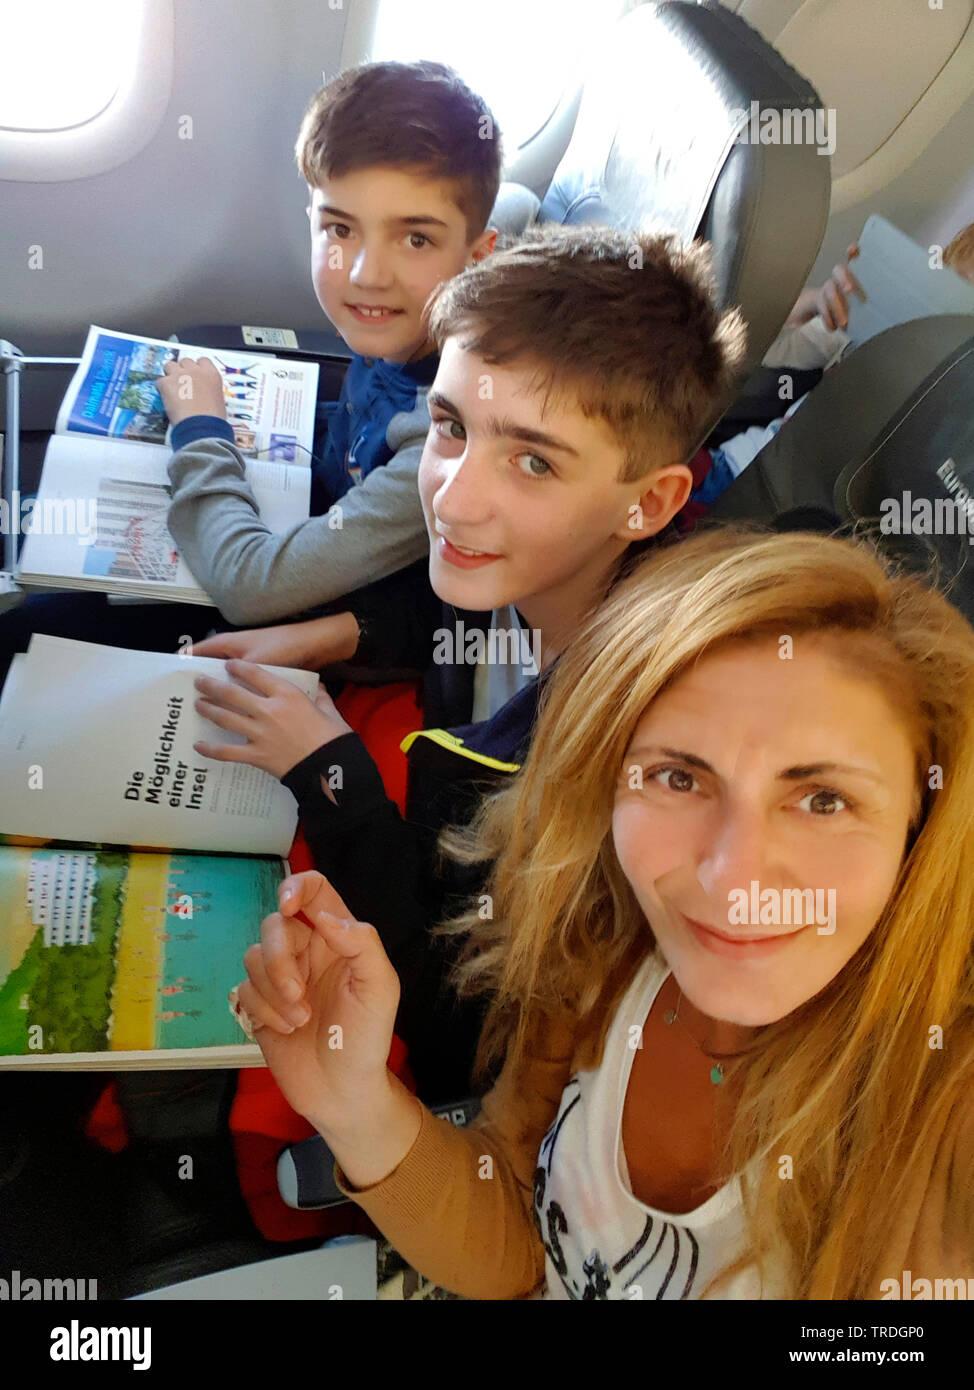 Mutter mit Kindern im Flugzeug nach Mallorca, Spanien, Balearen, Mallorca, MR=yes | mother with children in an airplane, Spain, Balearic Islands, Majo - Stock Image